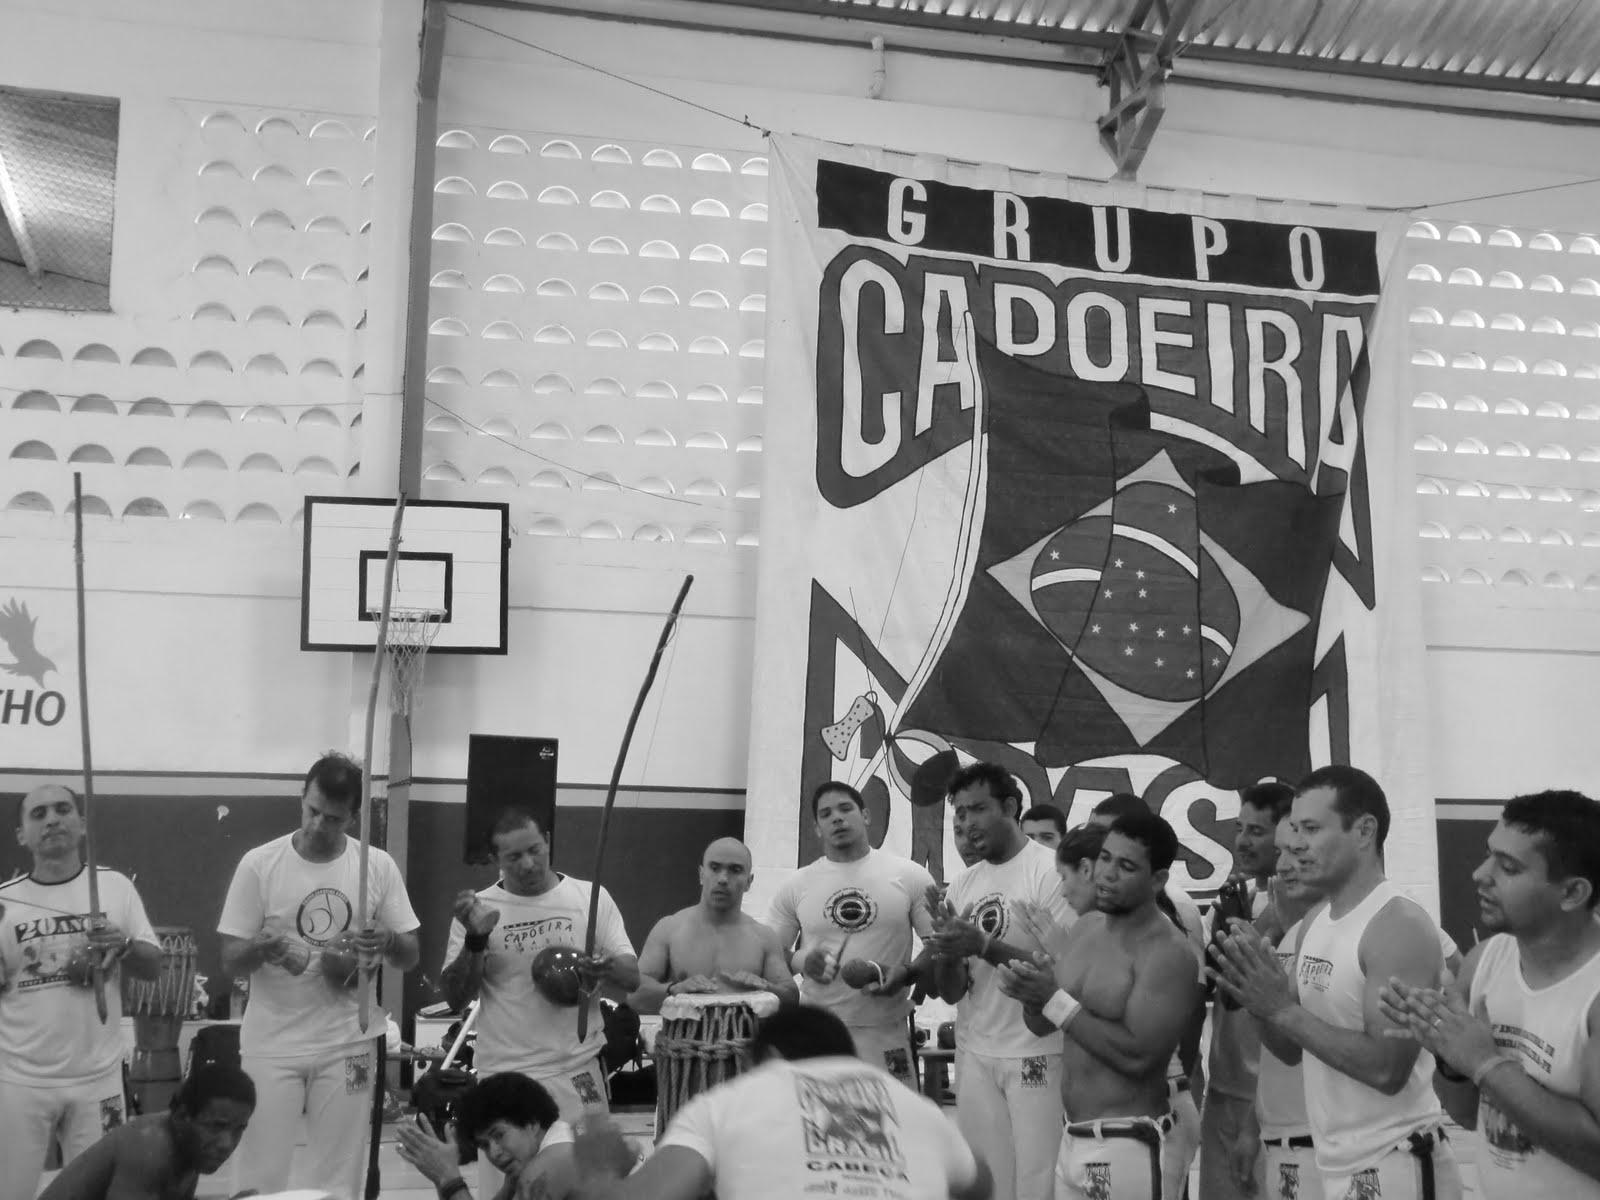 Capoeira Brasil in Köln und Bocholt: Grupo Capoeira Brasil